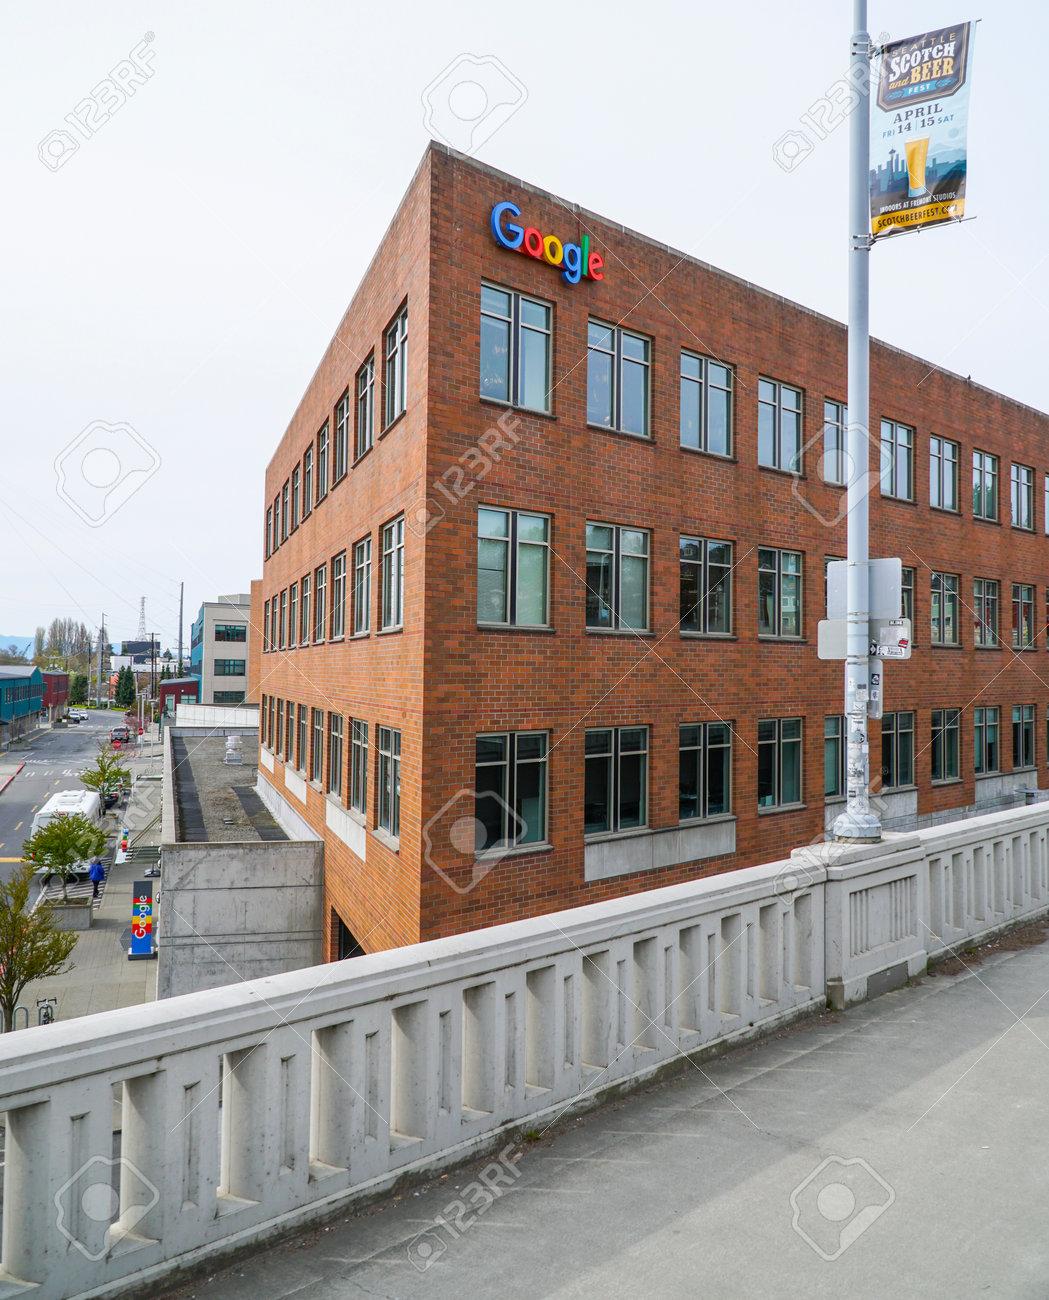 Google Maps Headquarter In Seattle - SEATTLE / WASHINGTON - APRIL ...